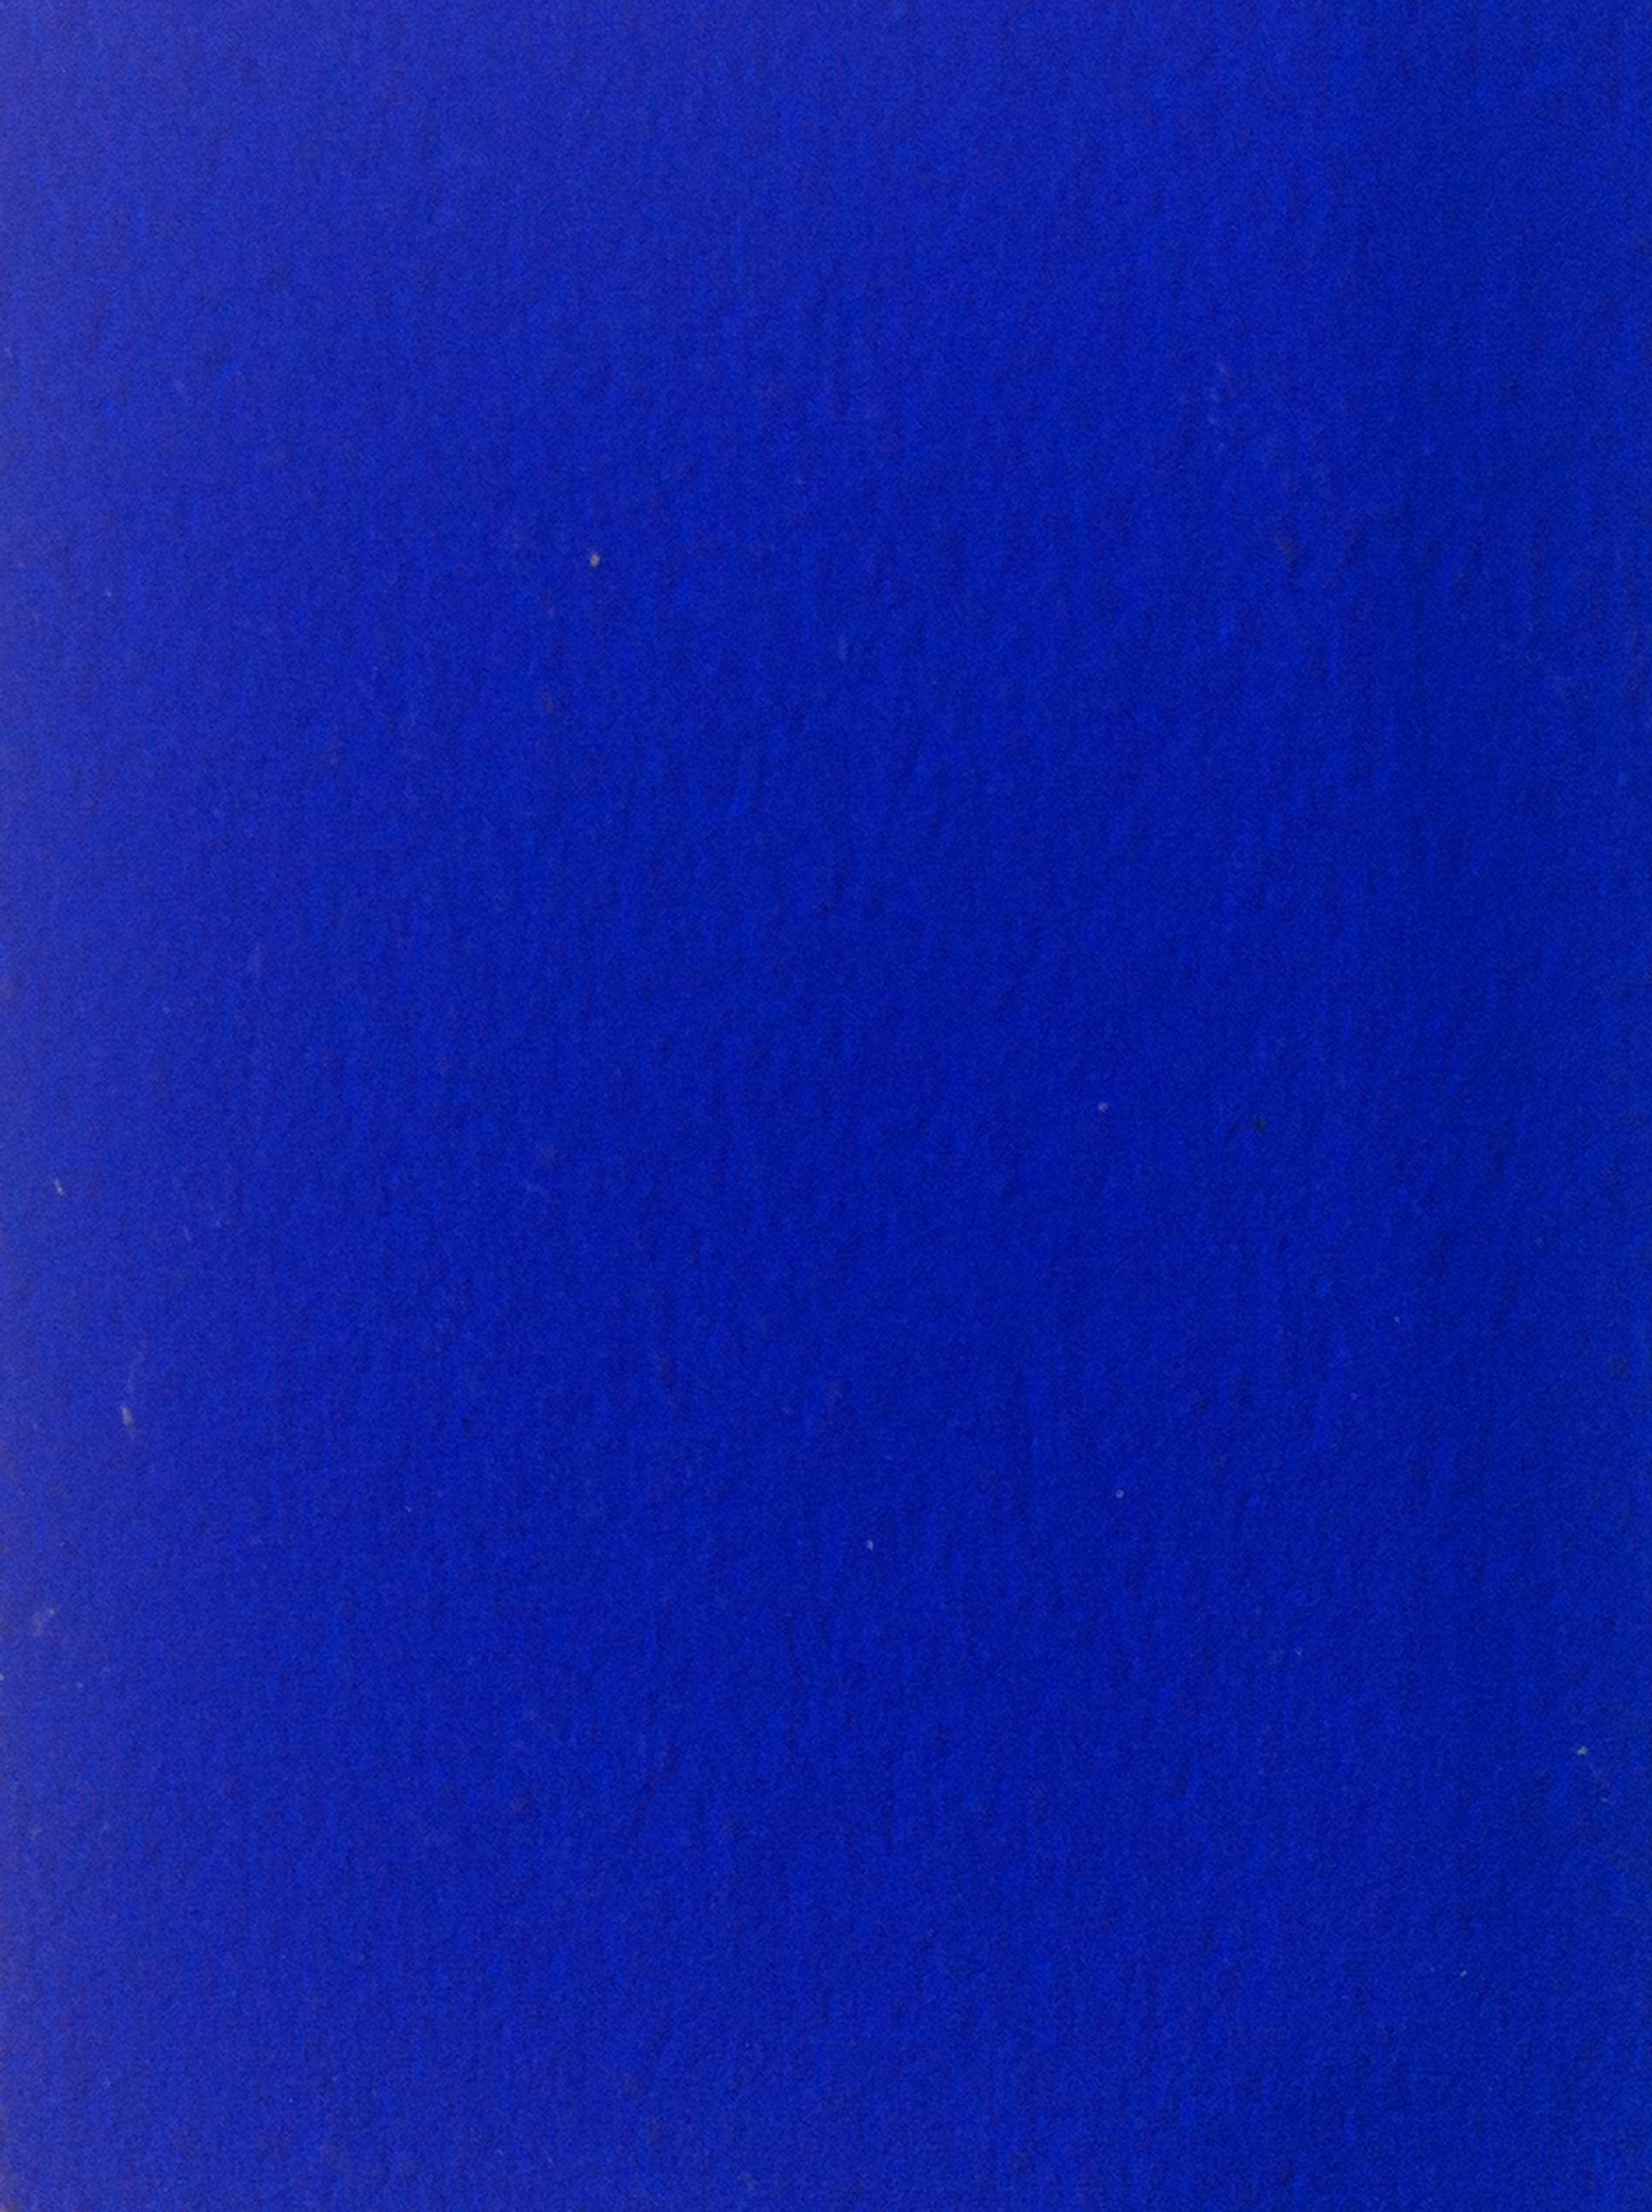 bristol matt paint in ultramarine 1035 very similar to yves klein